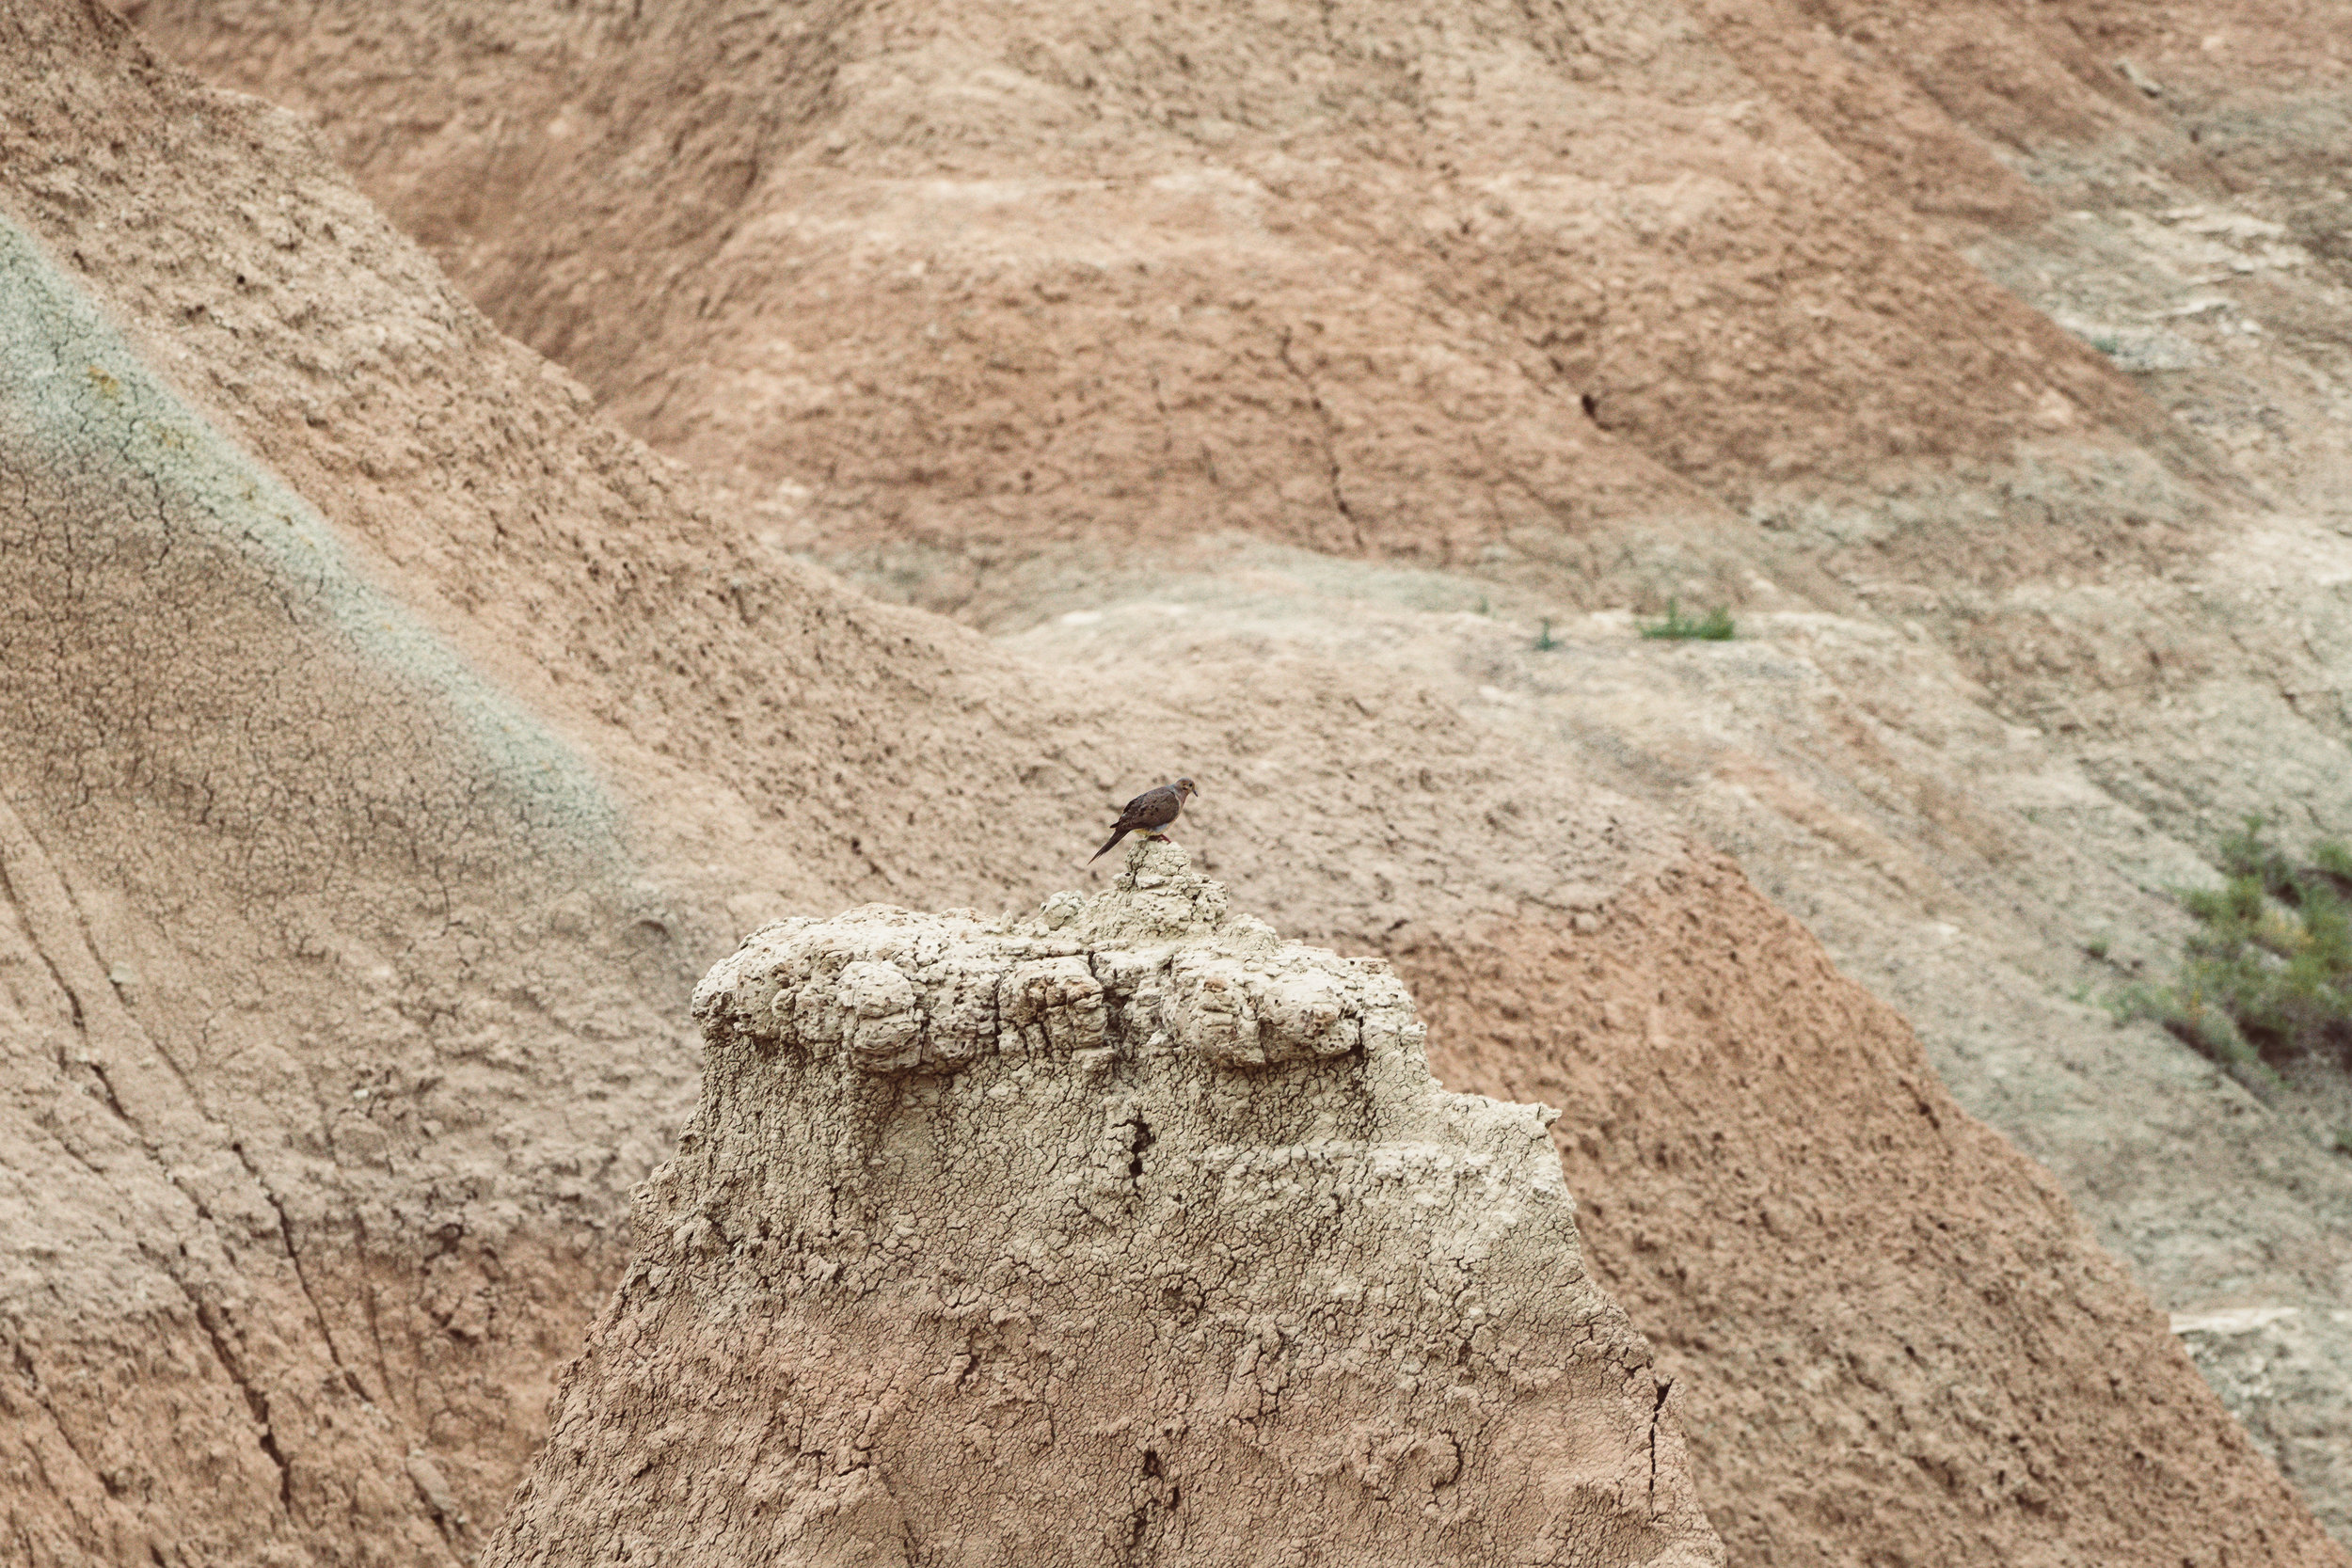 Badlands-04837.jpg